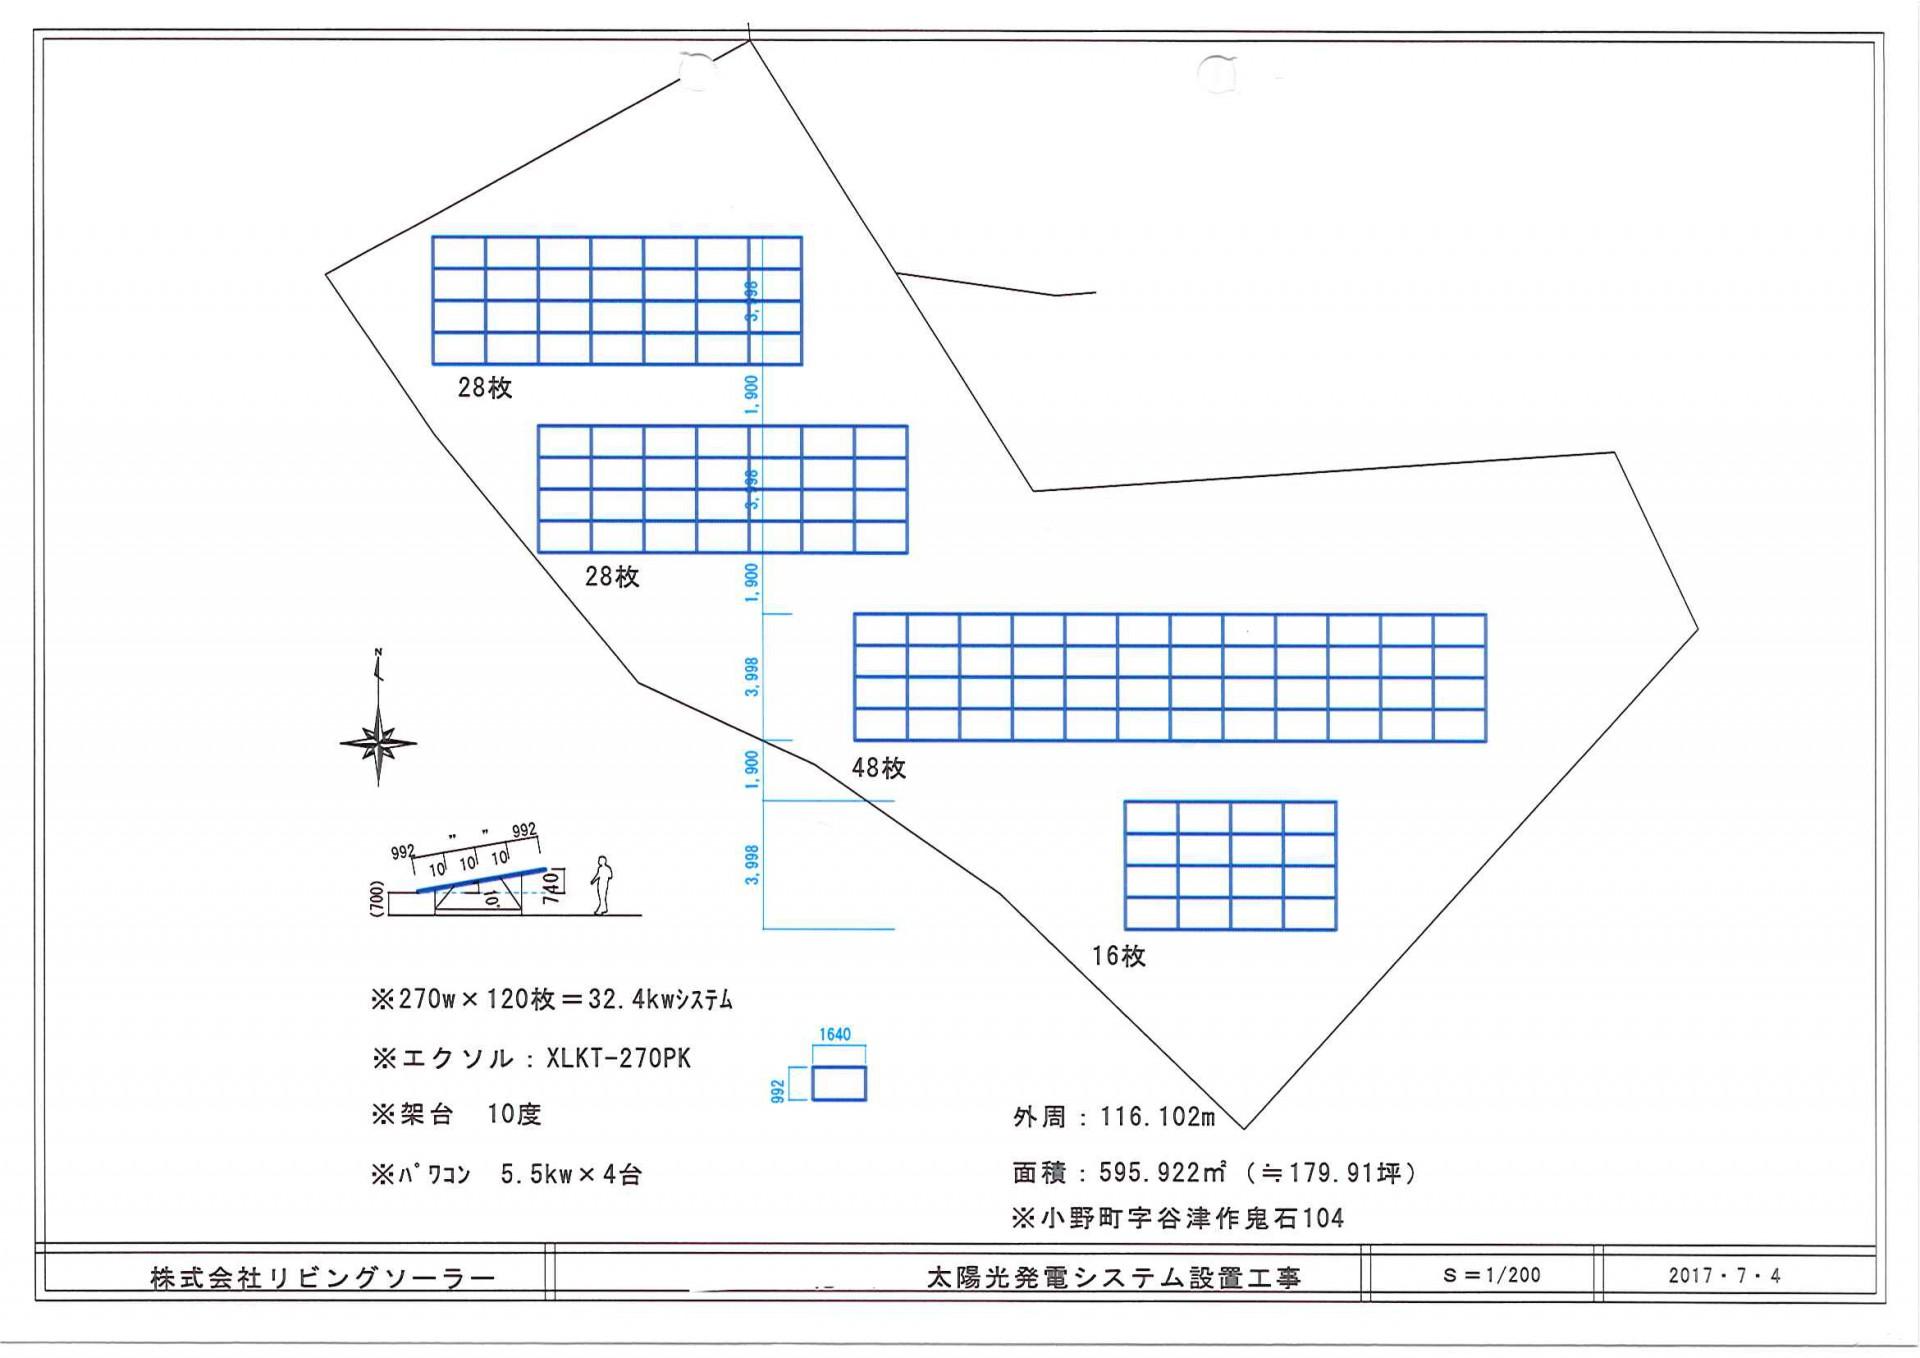 【LS】FIT24円 福島県いわき⑨発電所のメイン画像